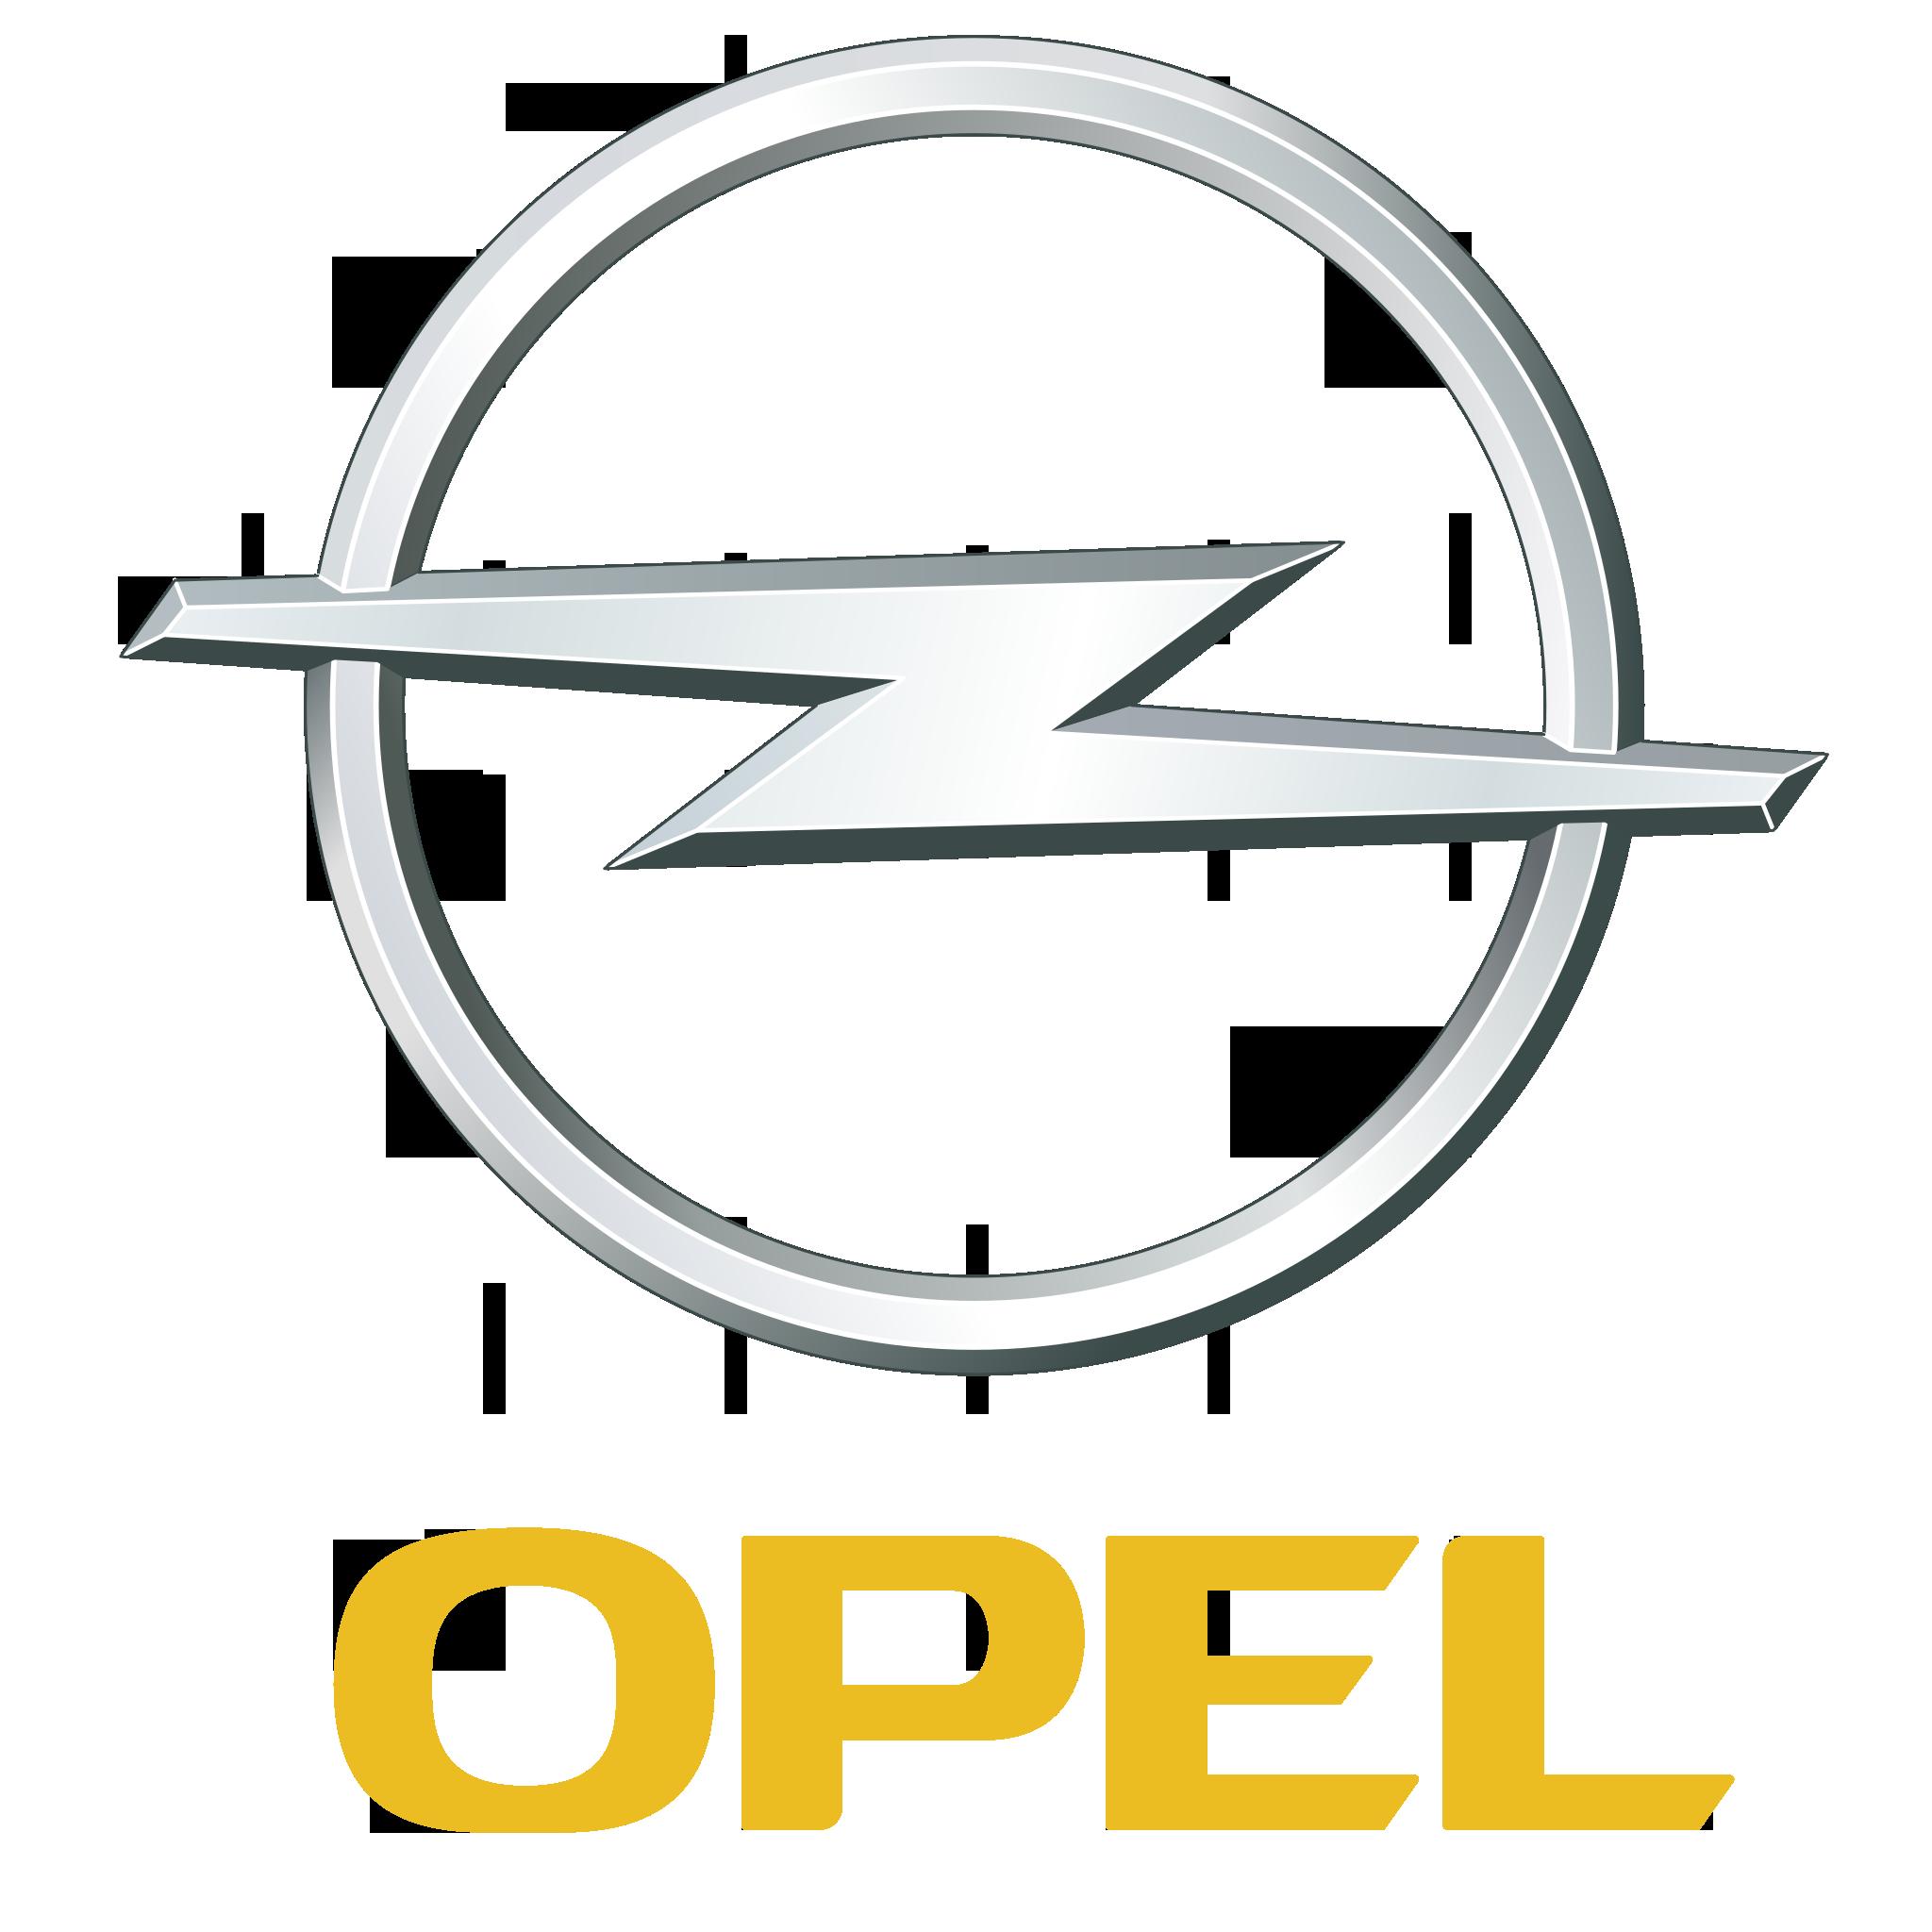 Opel Logo (2002) 2048X2048 Hd Png - Opel, Transparent background PNG HD thumbnail